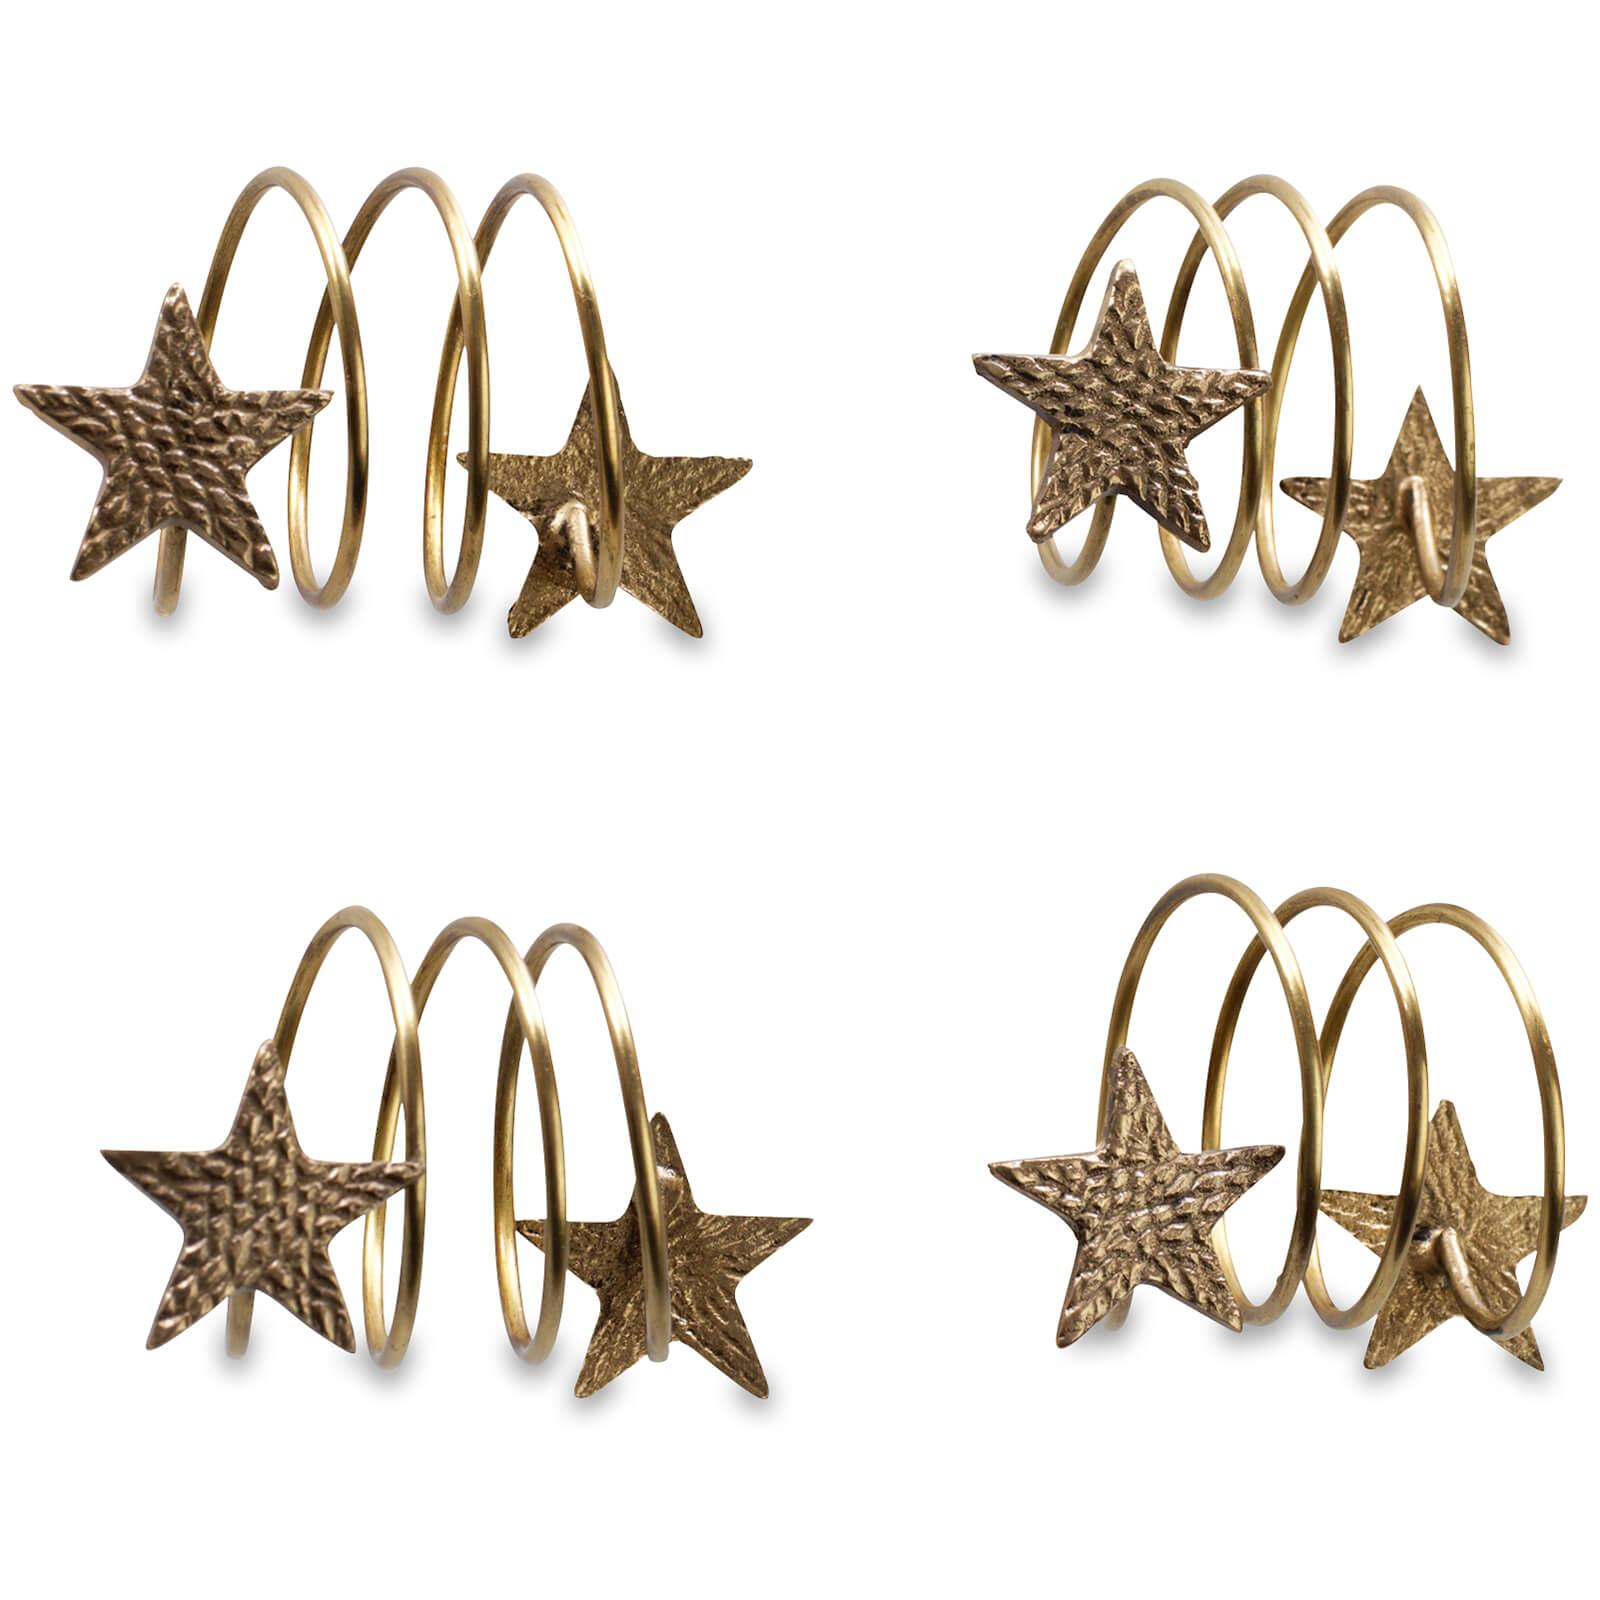 Nkuku Star Napkin Rings - Antique Brass (Set of 4)